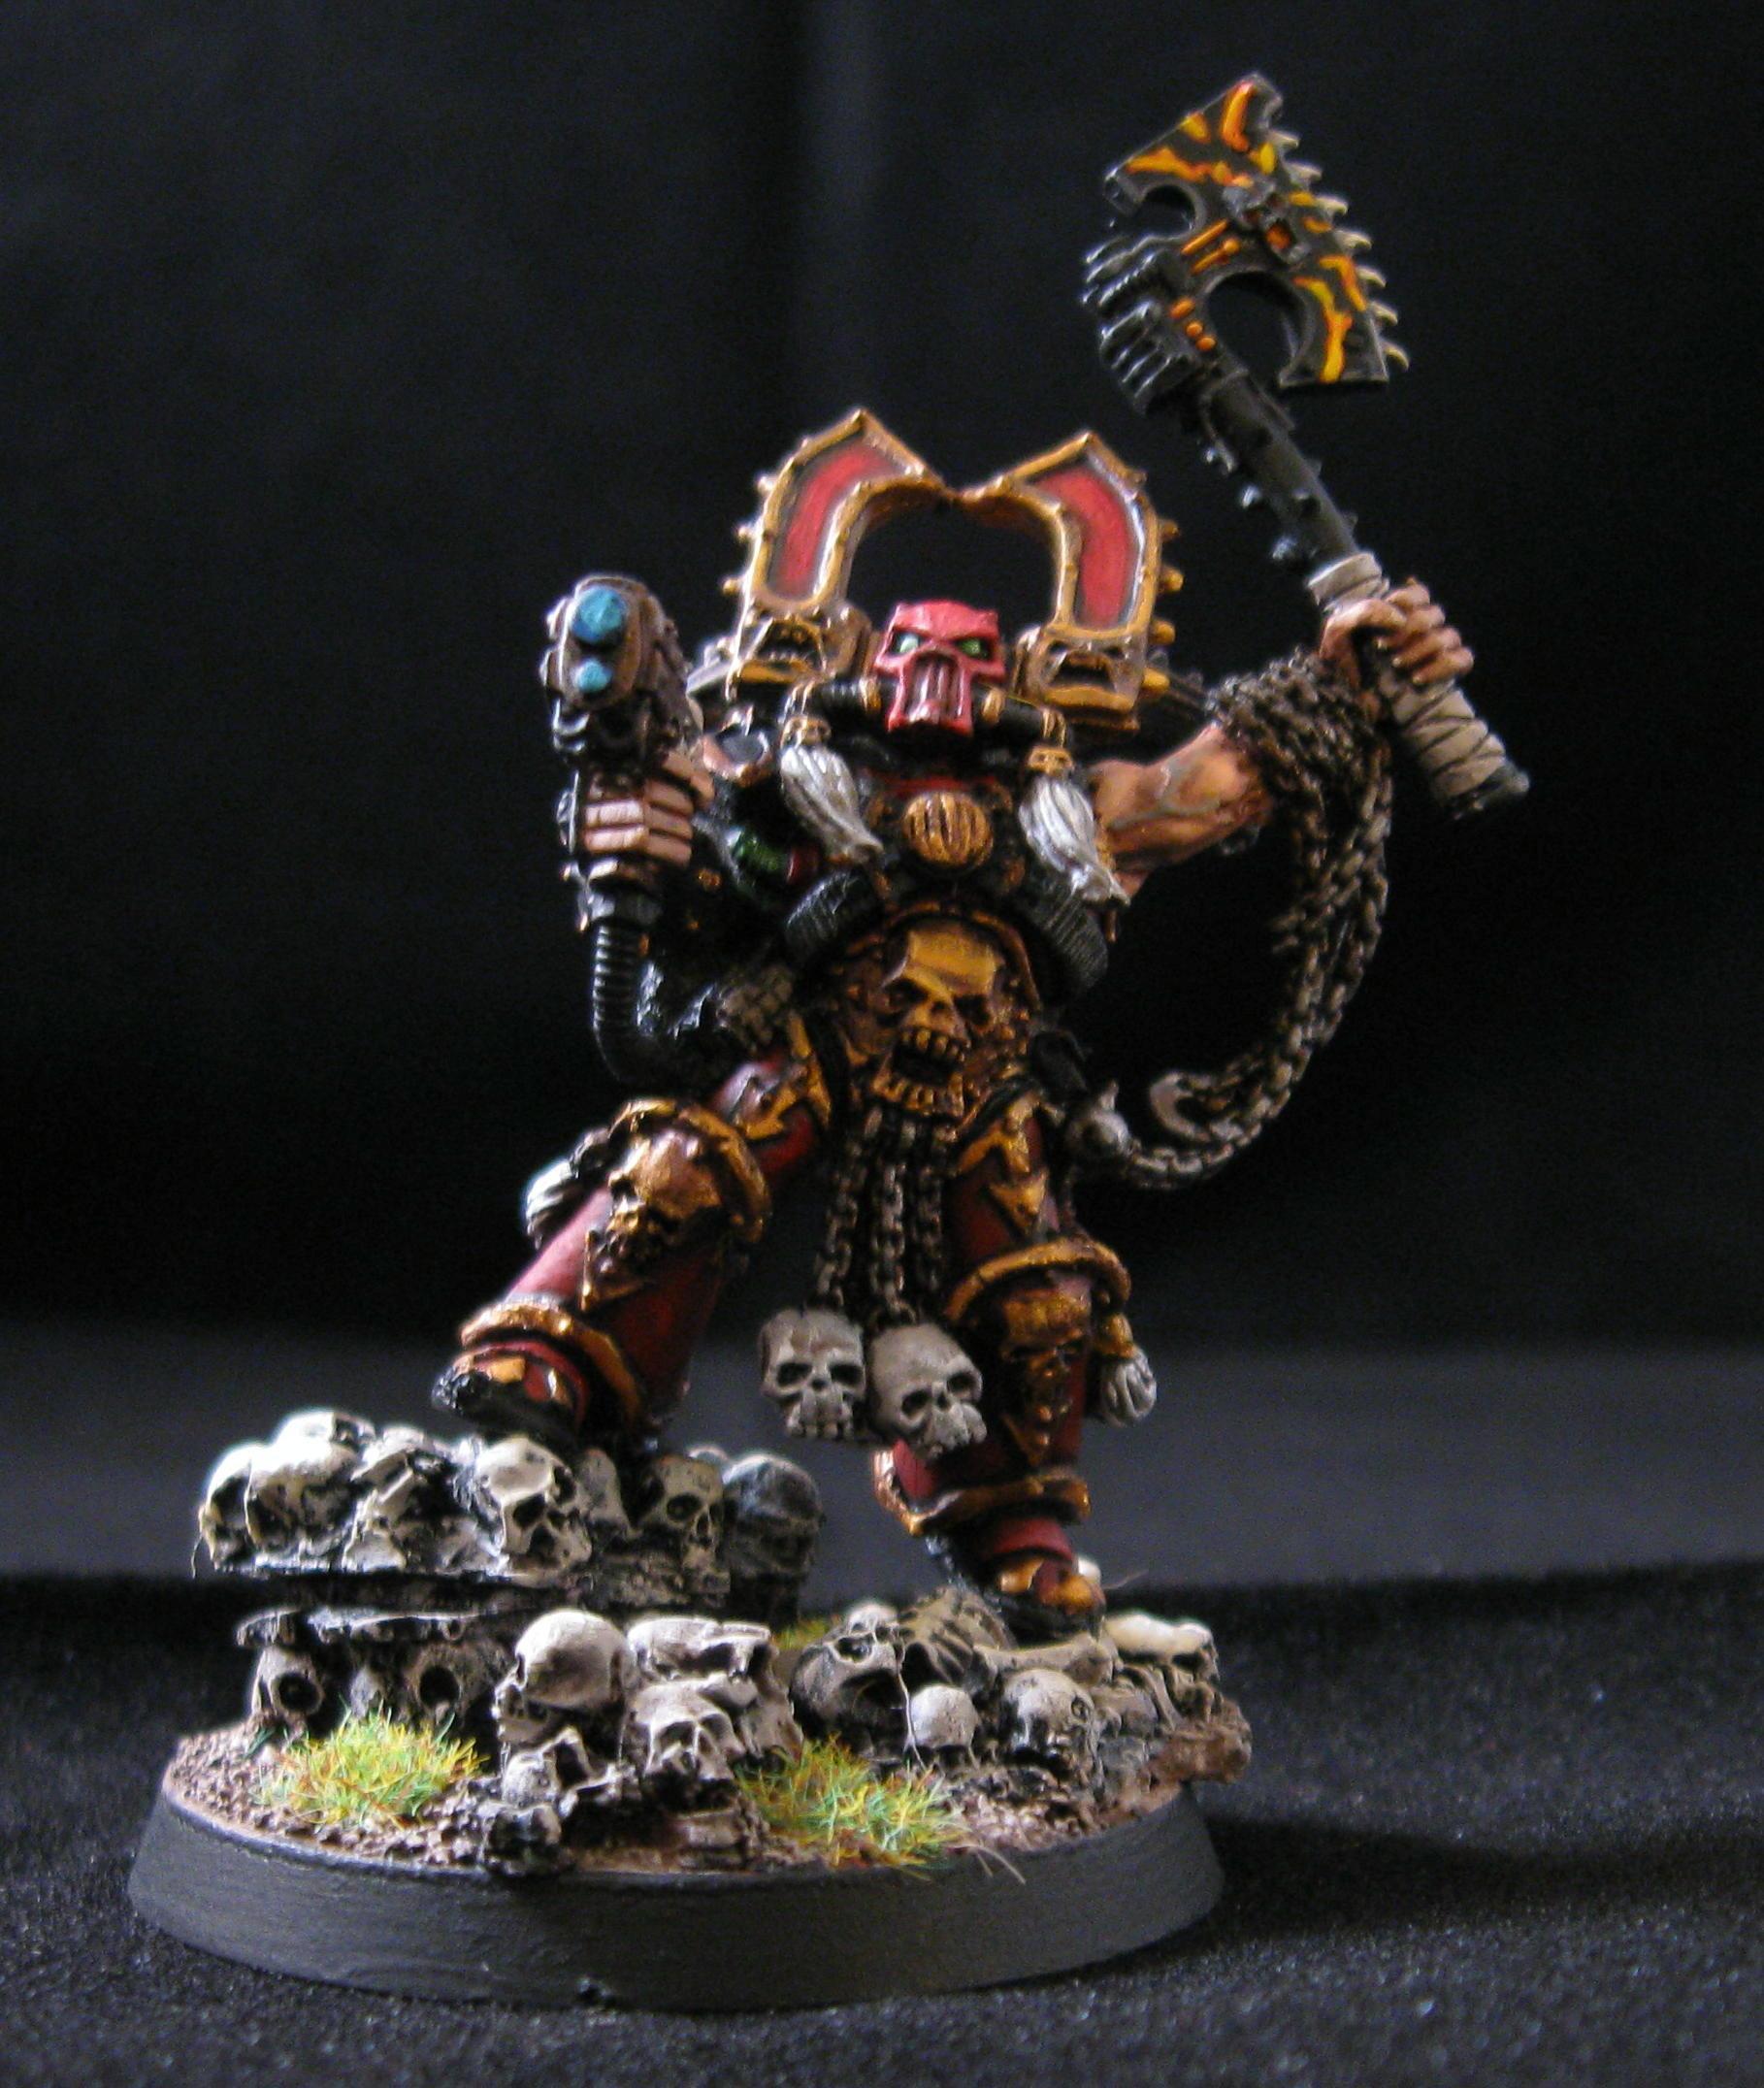 Betrayer, Blood, Chaos, Chaos Space Marines, Character, Kharn, Khorne, Skull, Warhammer 40,000